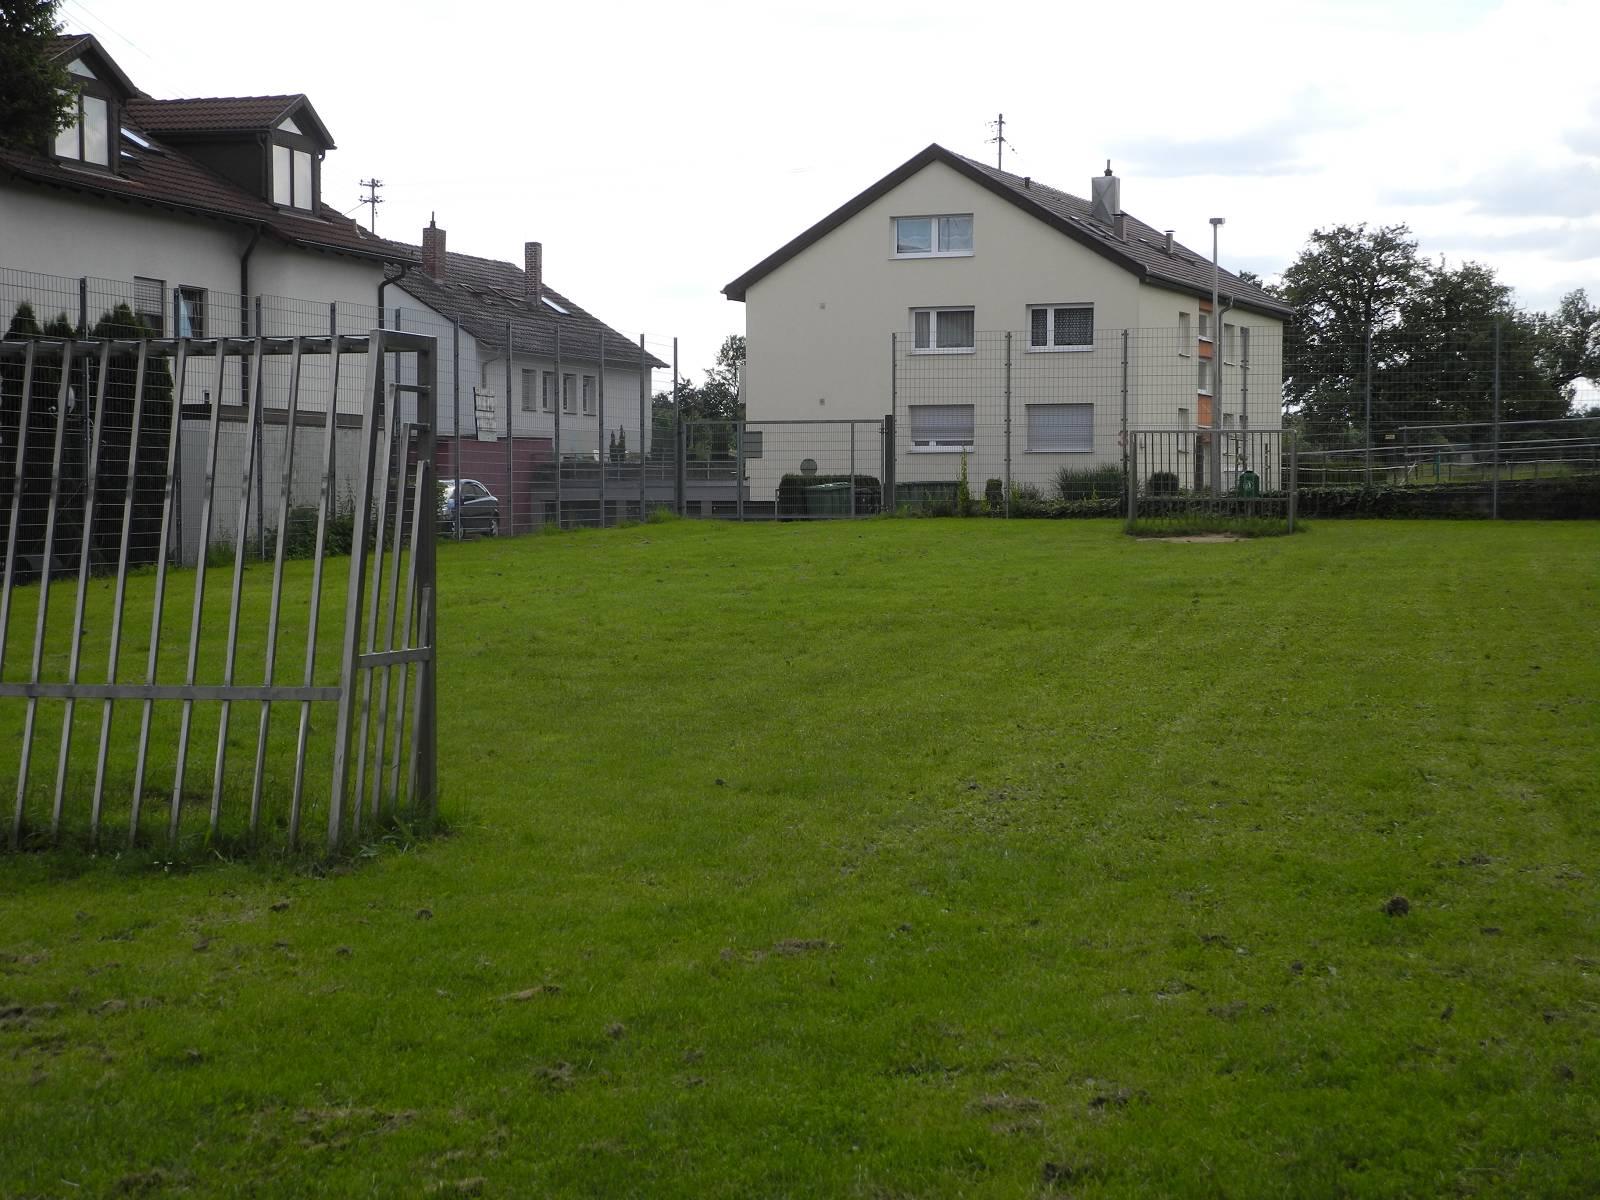 Kinderspielplatz Mendelssohnstraße